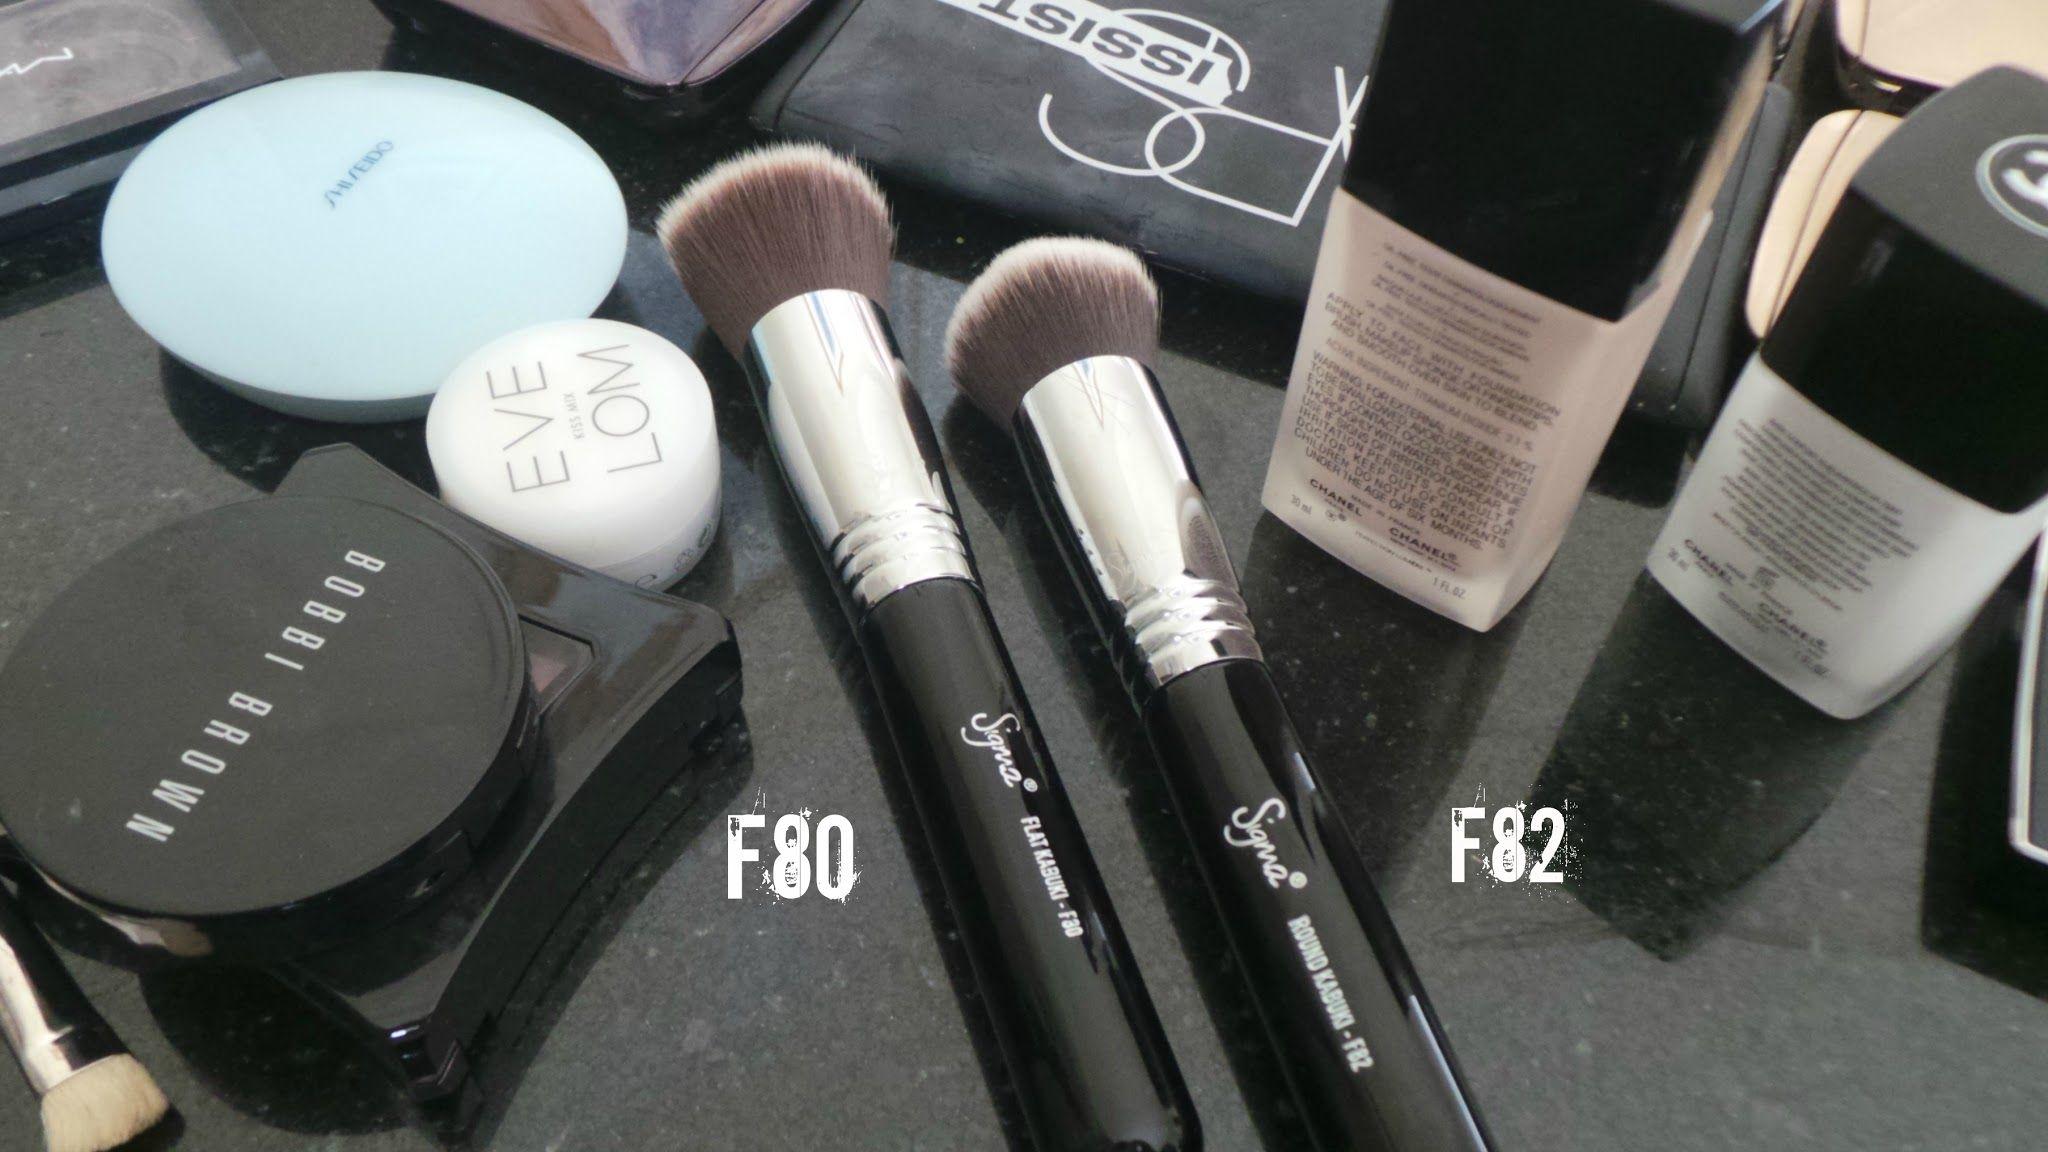 Expat Make-Up Addict: The 30 second post-Lip Six!